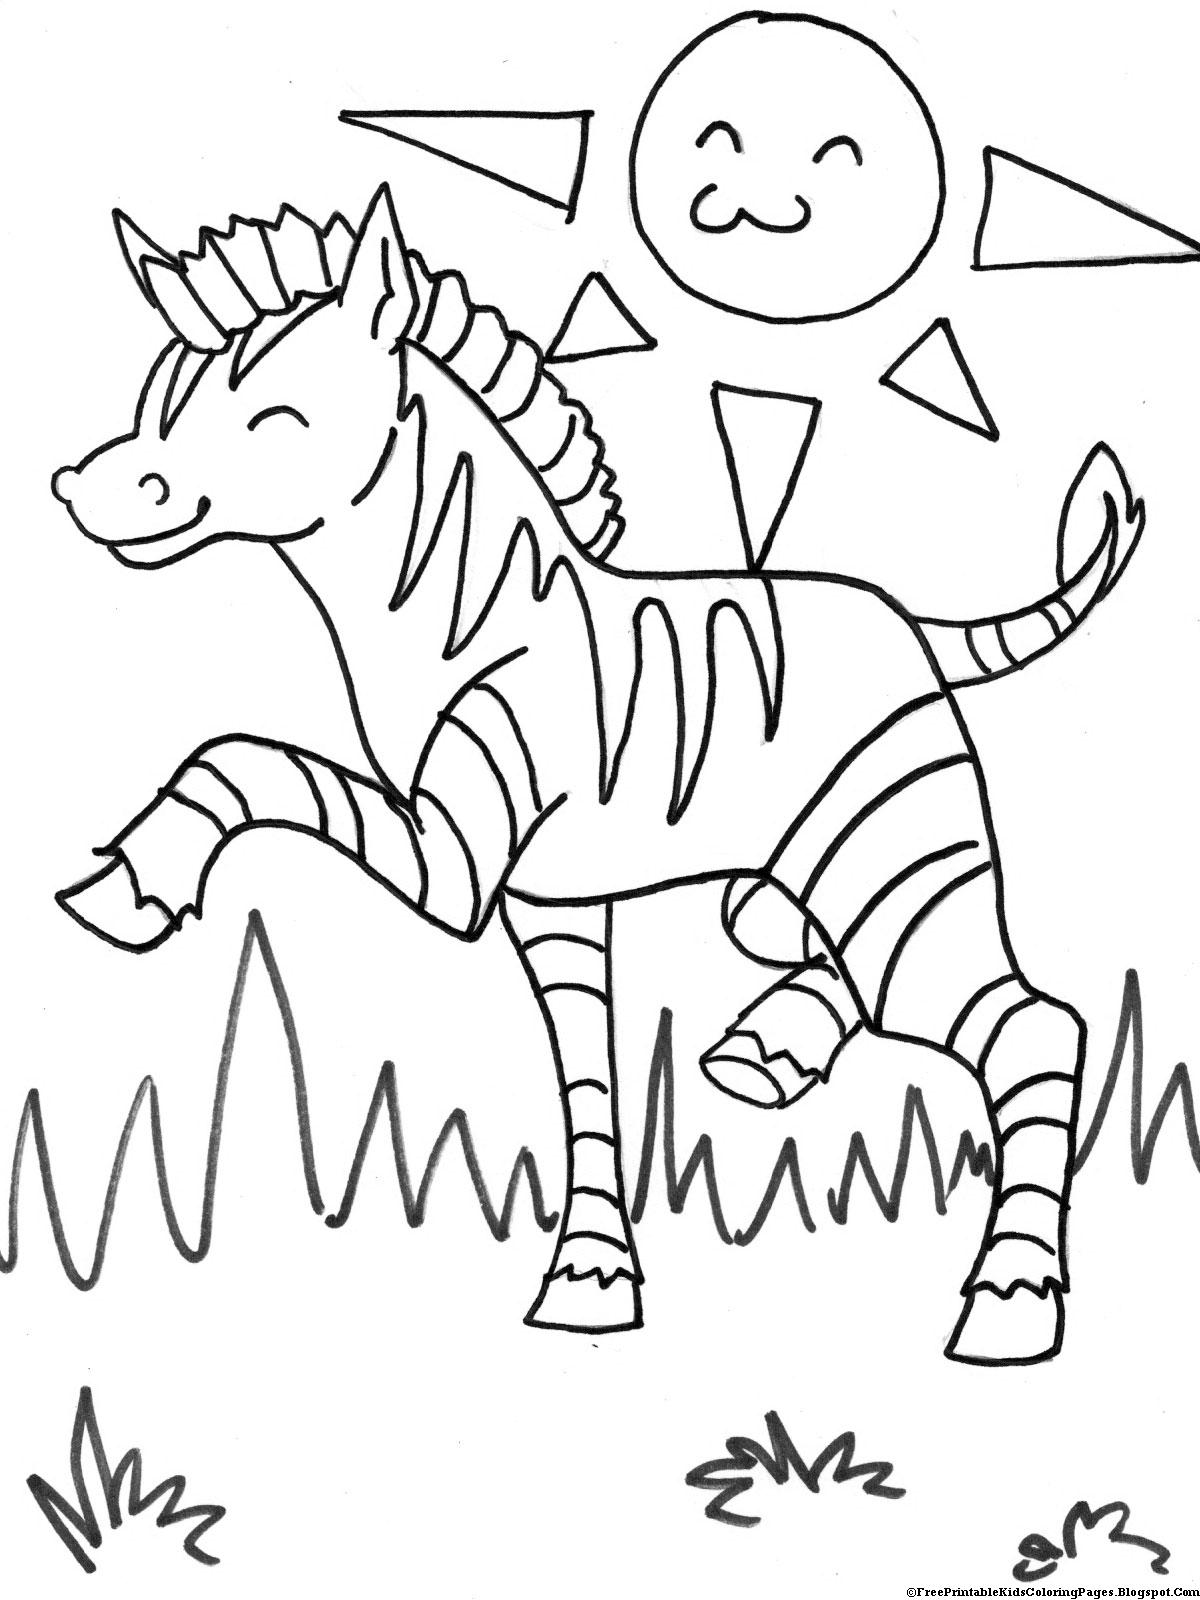 baby zebra coloring pages zebra coloring pages getcoloringpagescom pages zebra coloring baby